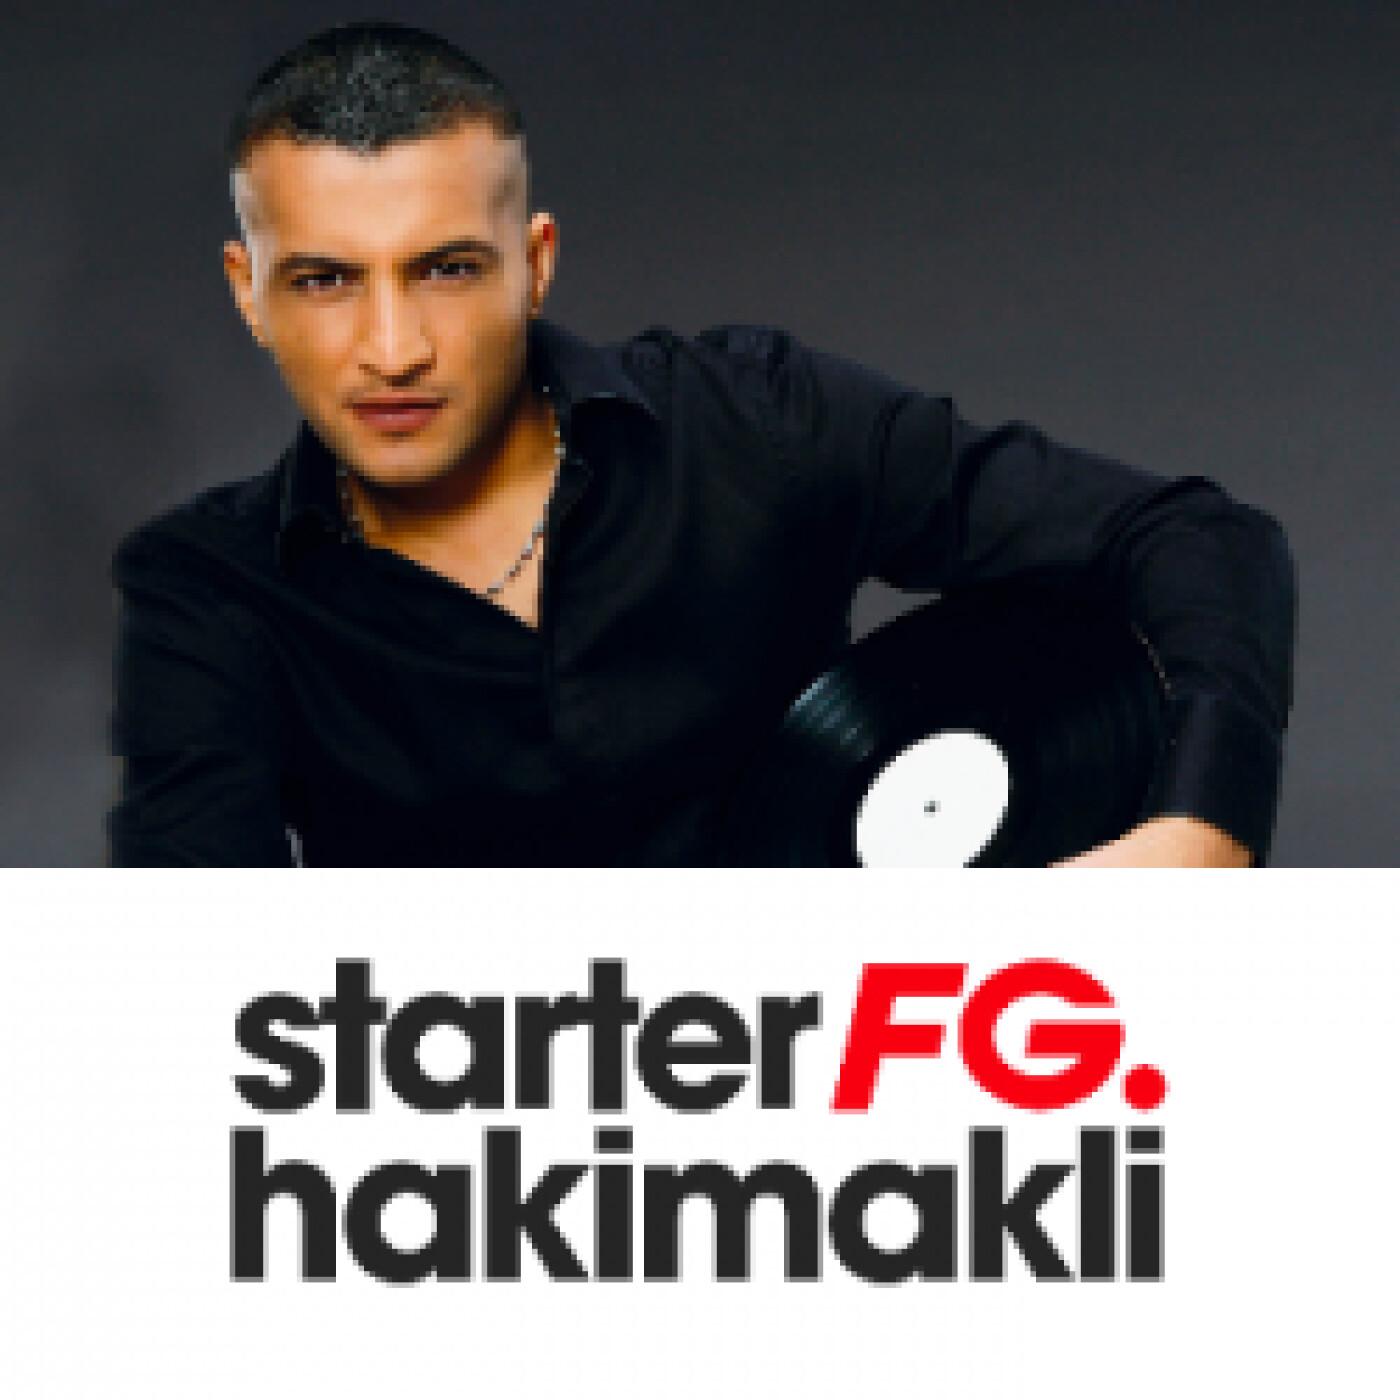 STARTER FG BY HAKIMAKLI MERCREDI 9 JUIN 2021